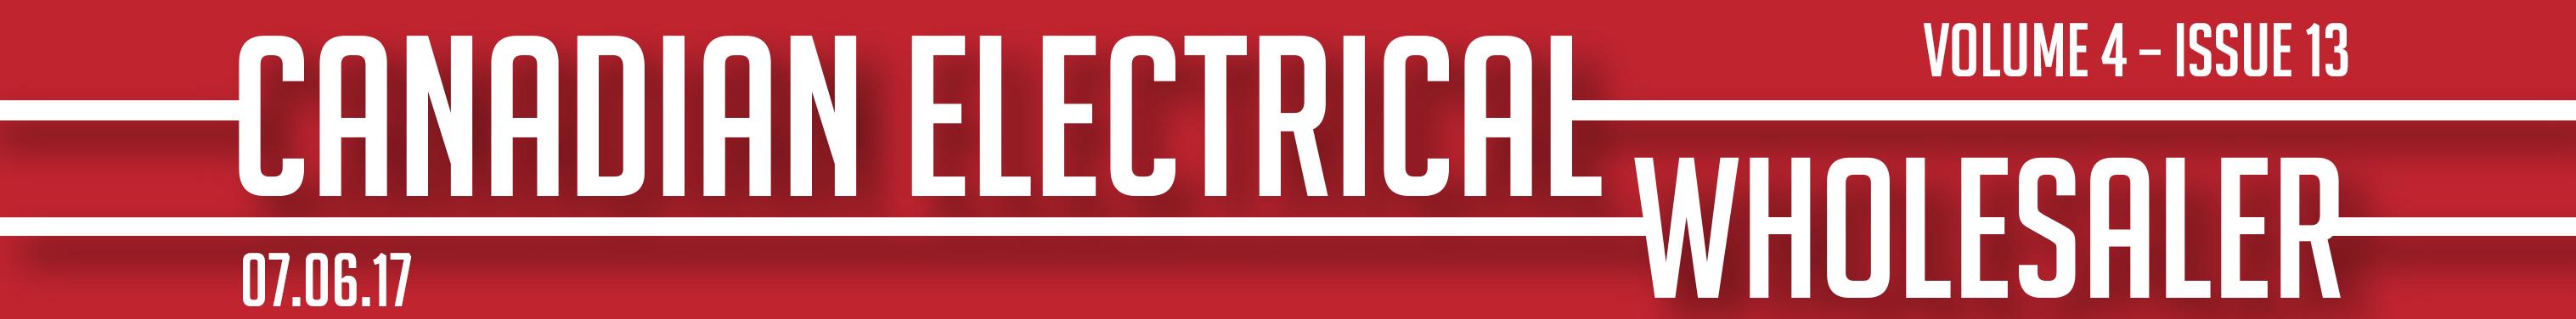 Canadian Electrical Wholesaler